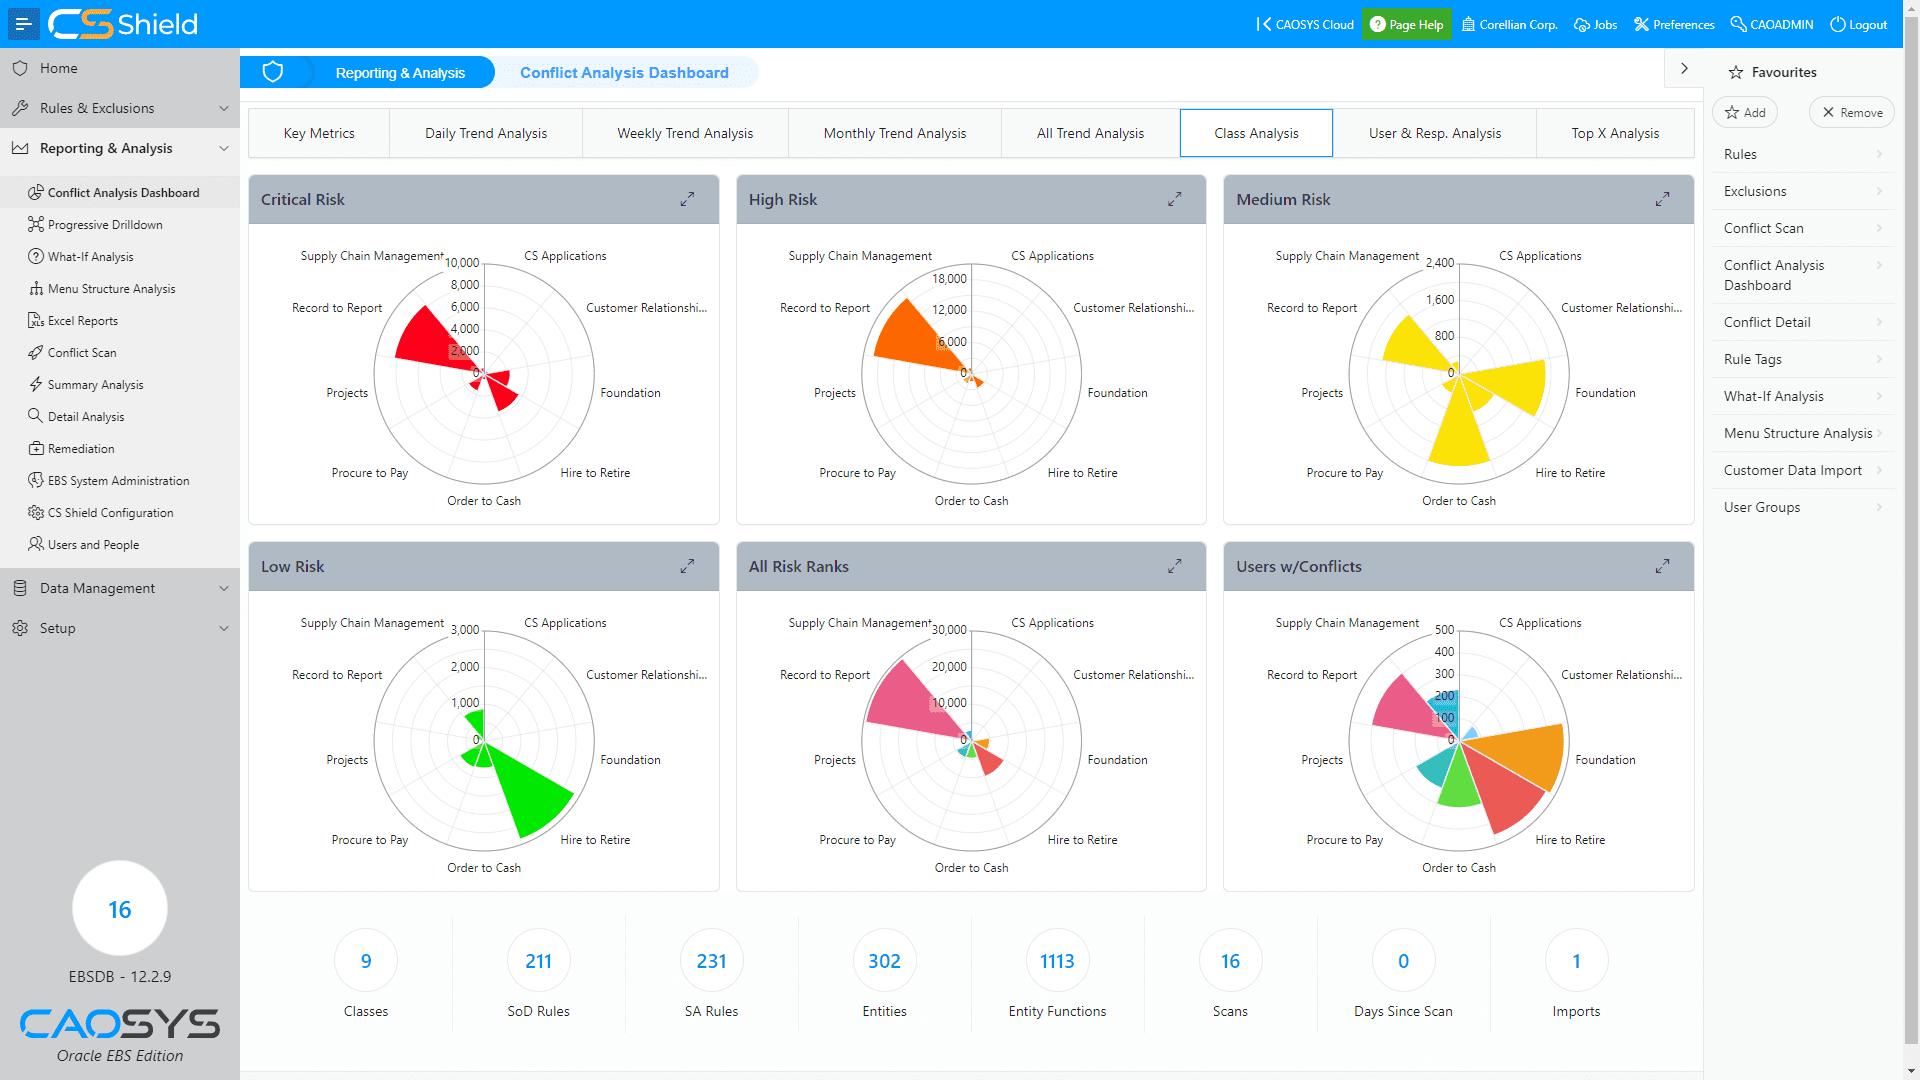 CSShield EBS - Dashboard - Class Analysis